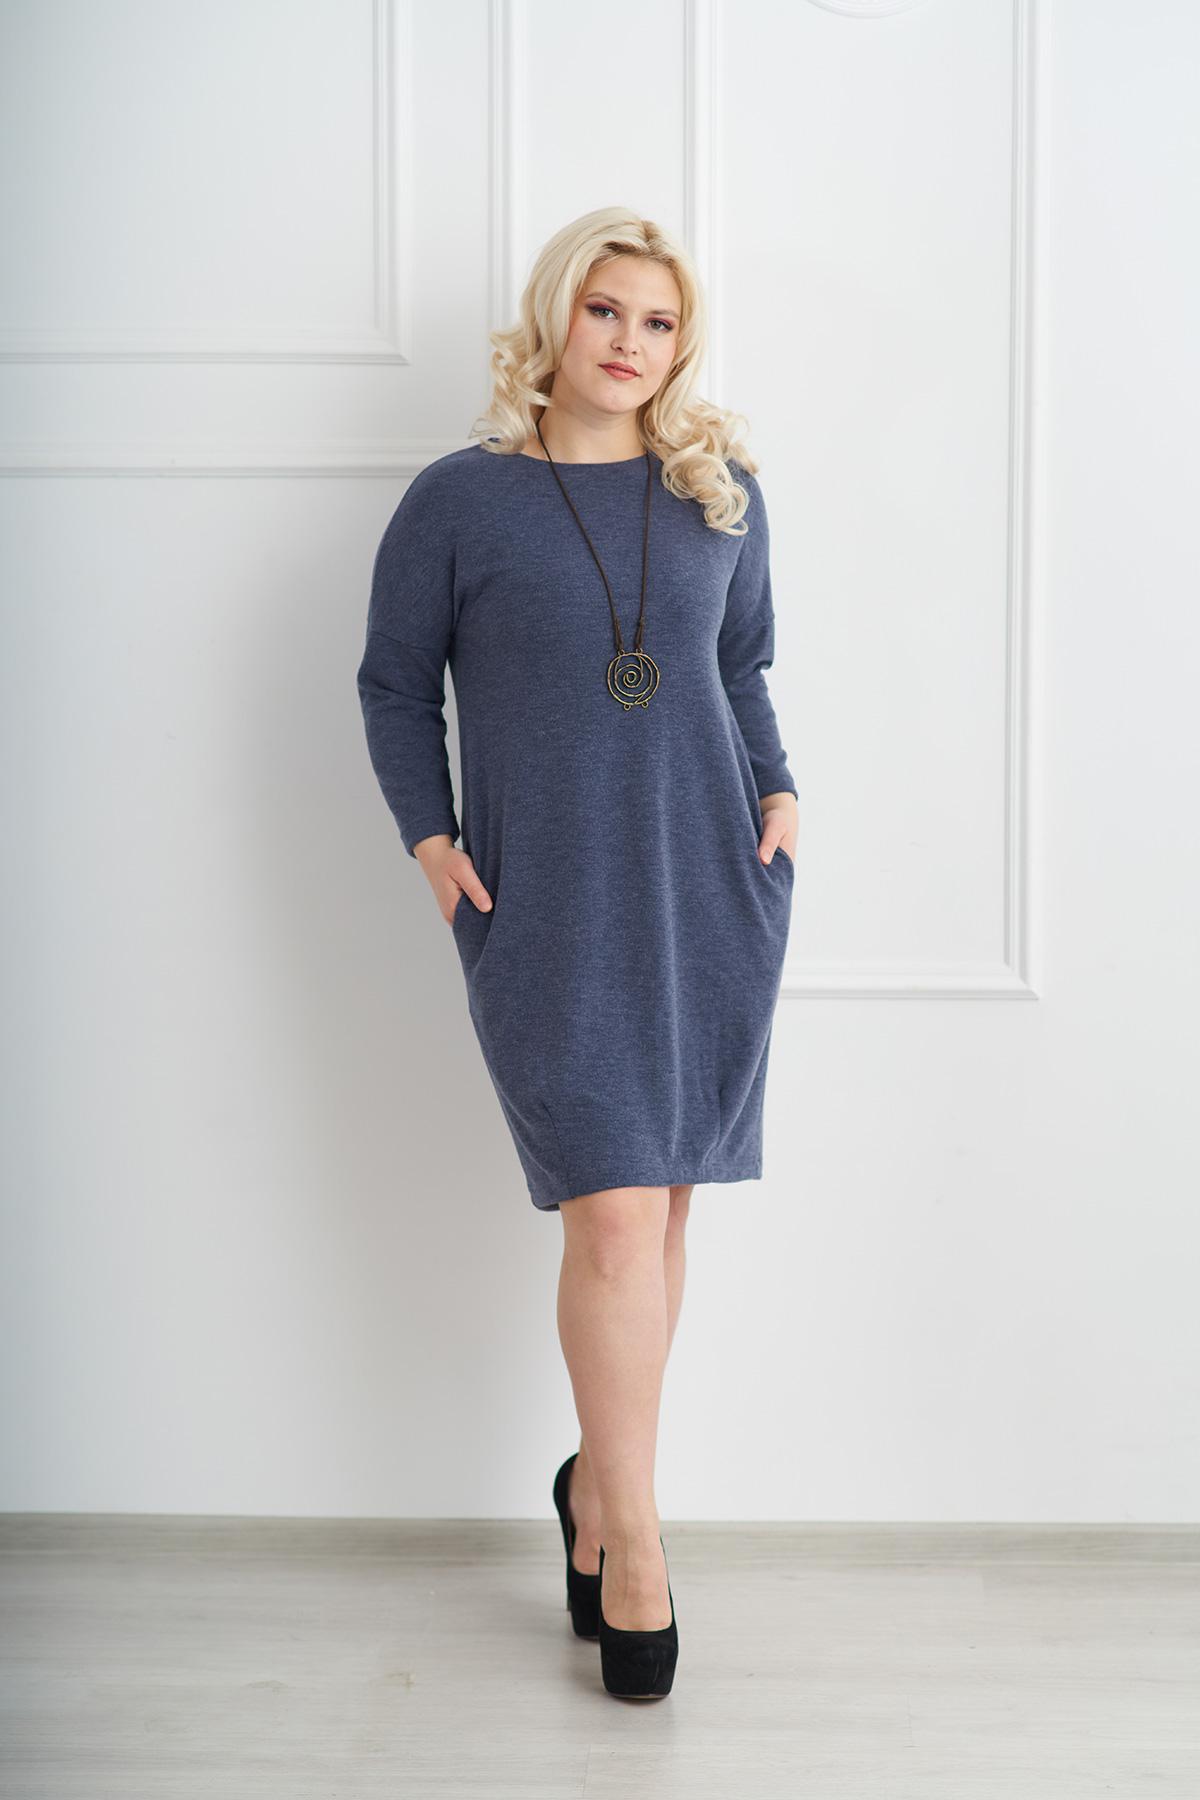 Жен. платье арт. 19-0075 Индиго р. 54Платья<br><br><br>Тип: Жен. платье<br>Размер: 54<br>Материал: Ангора